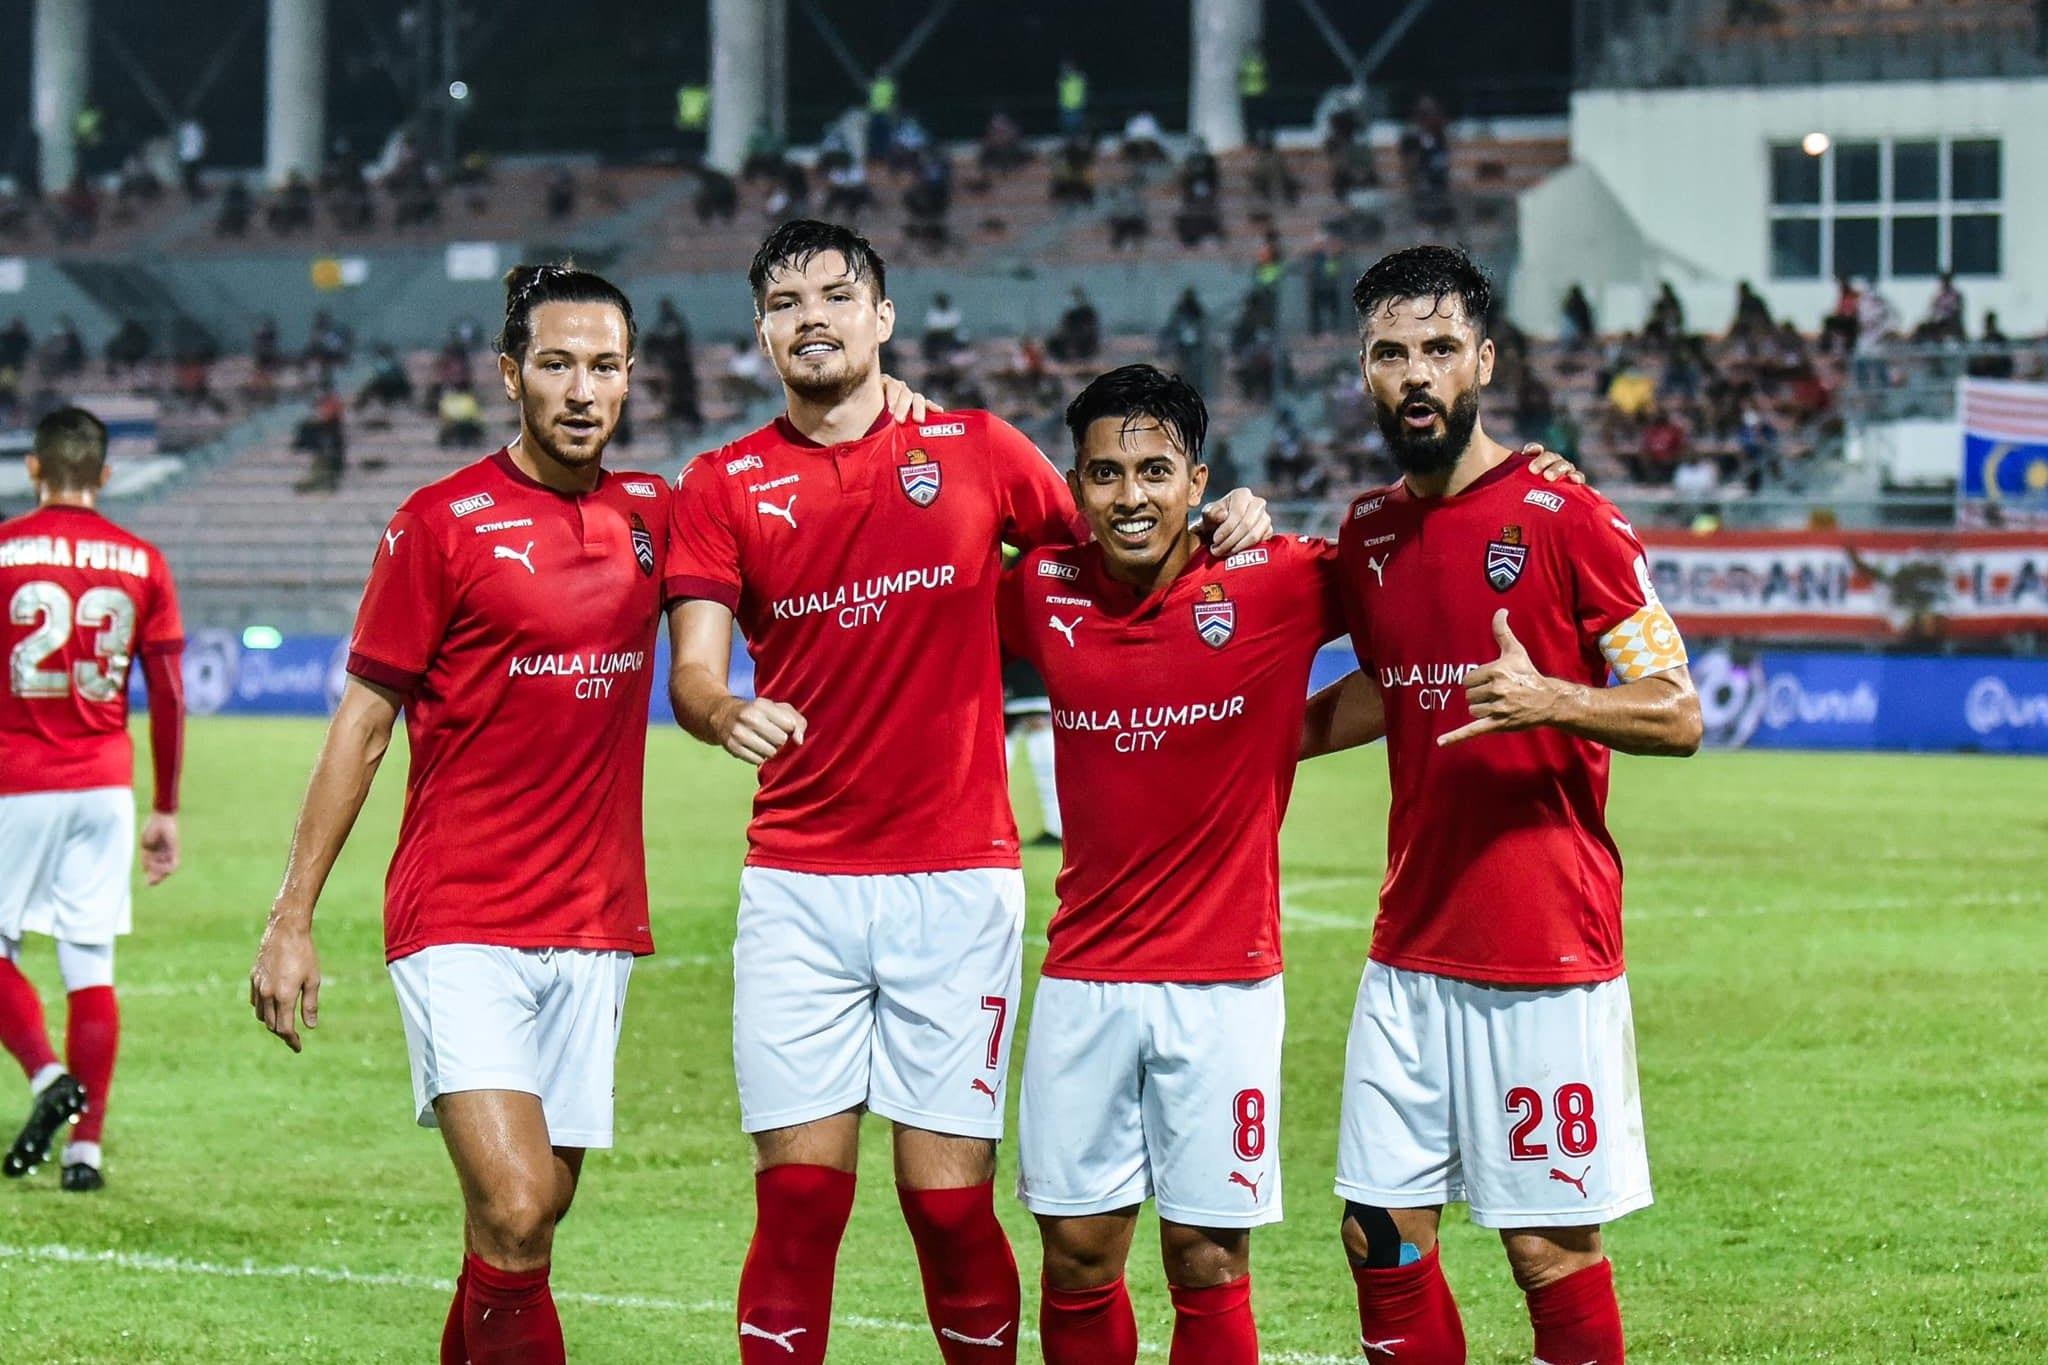 KL City FC Romel Morales Paulo Josue Naturalisasi Liga-M